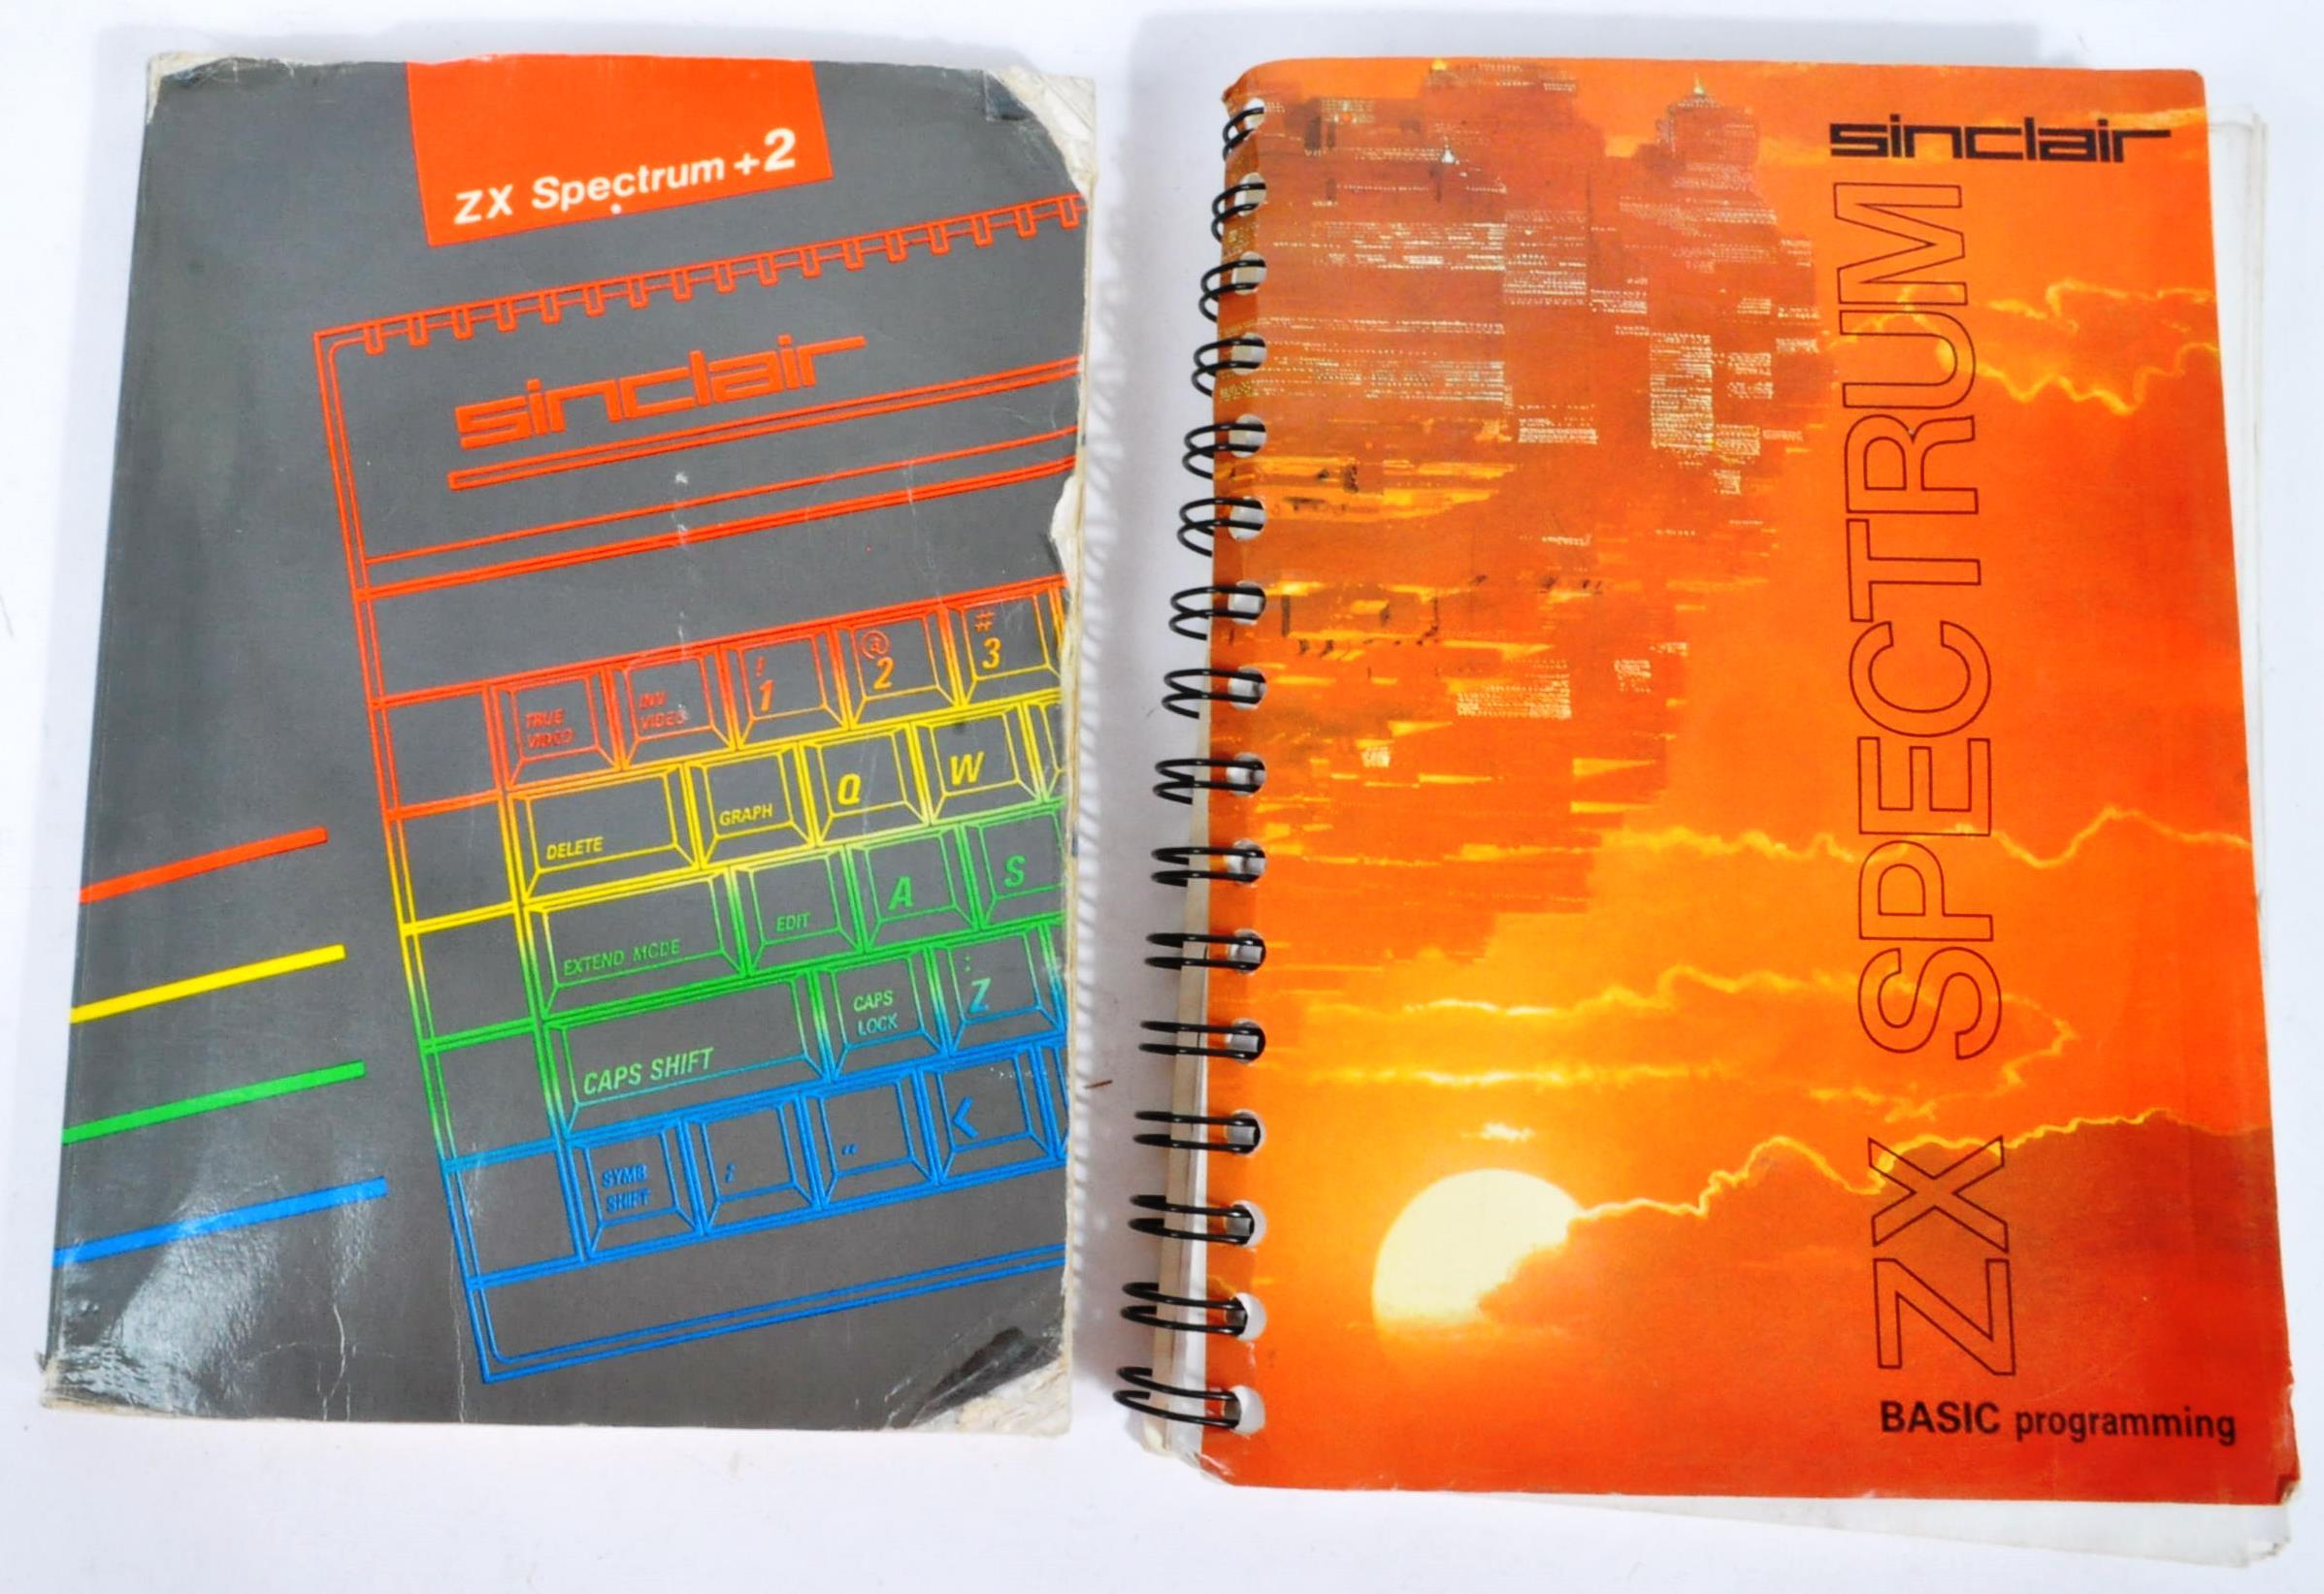 VINTAGE SINCLAIR ZX SPECTRUM CONSOLE, GAMES & ACCESSORIES - Image 8 of 8